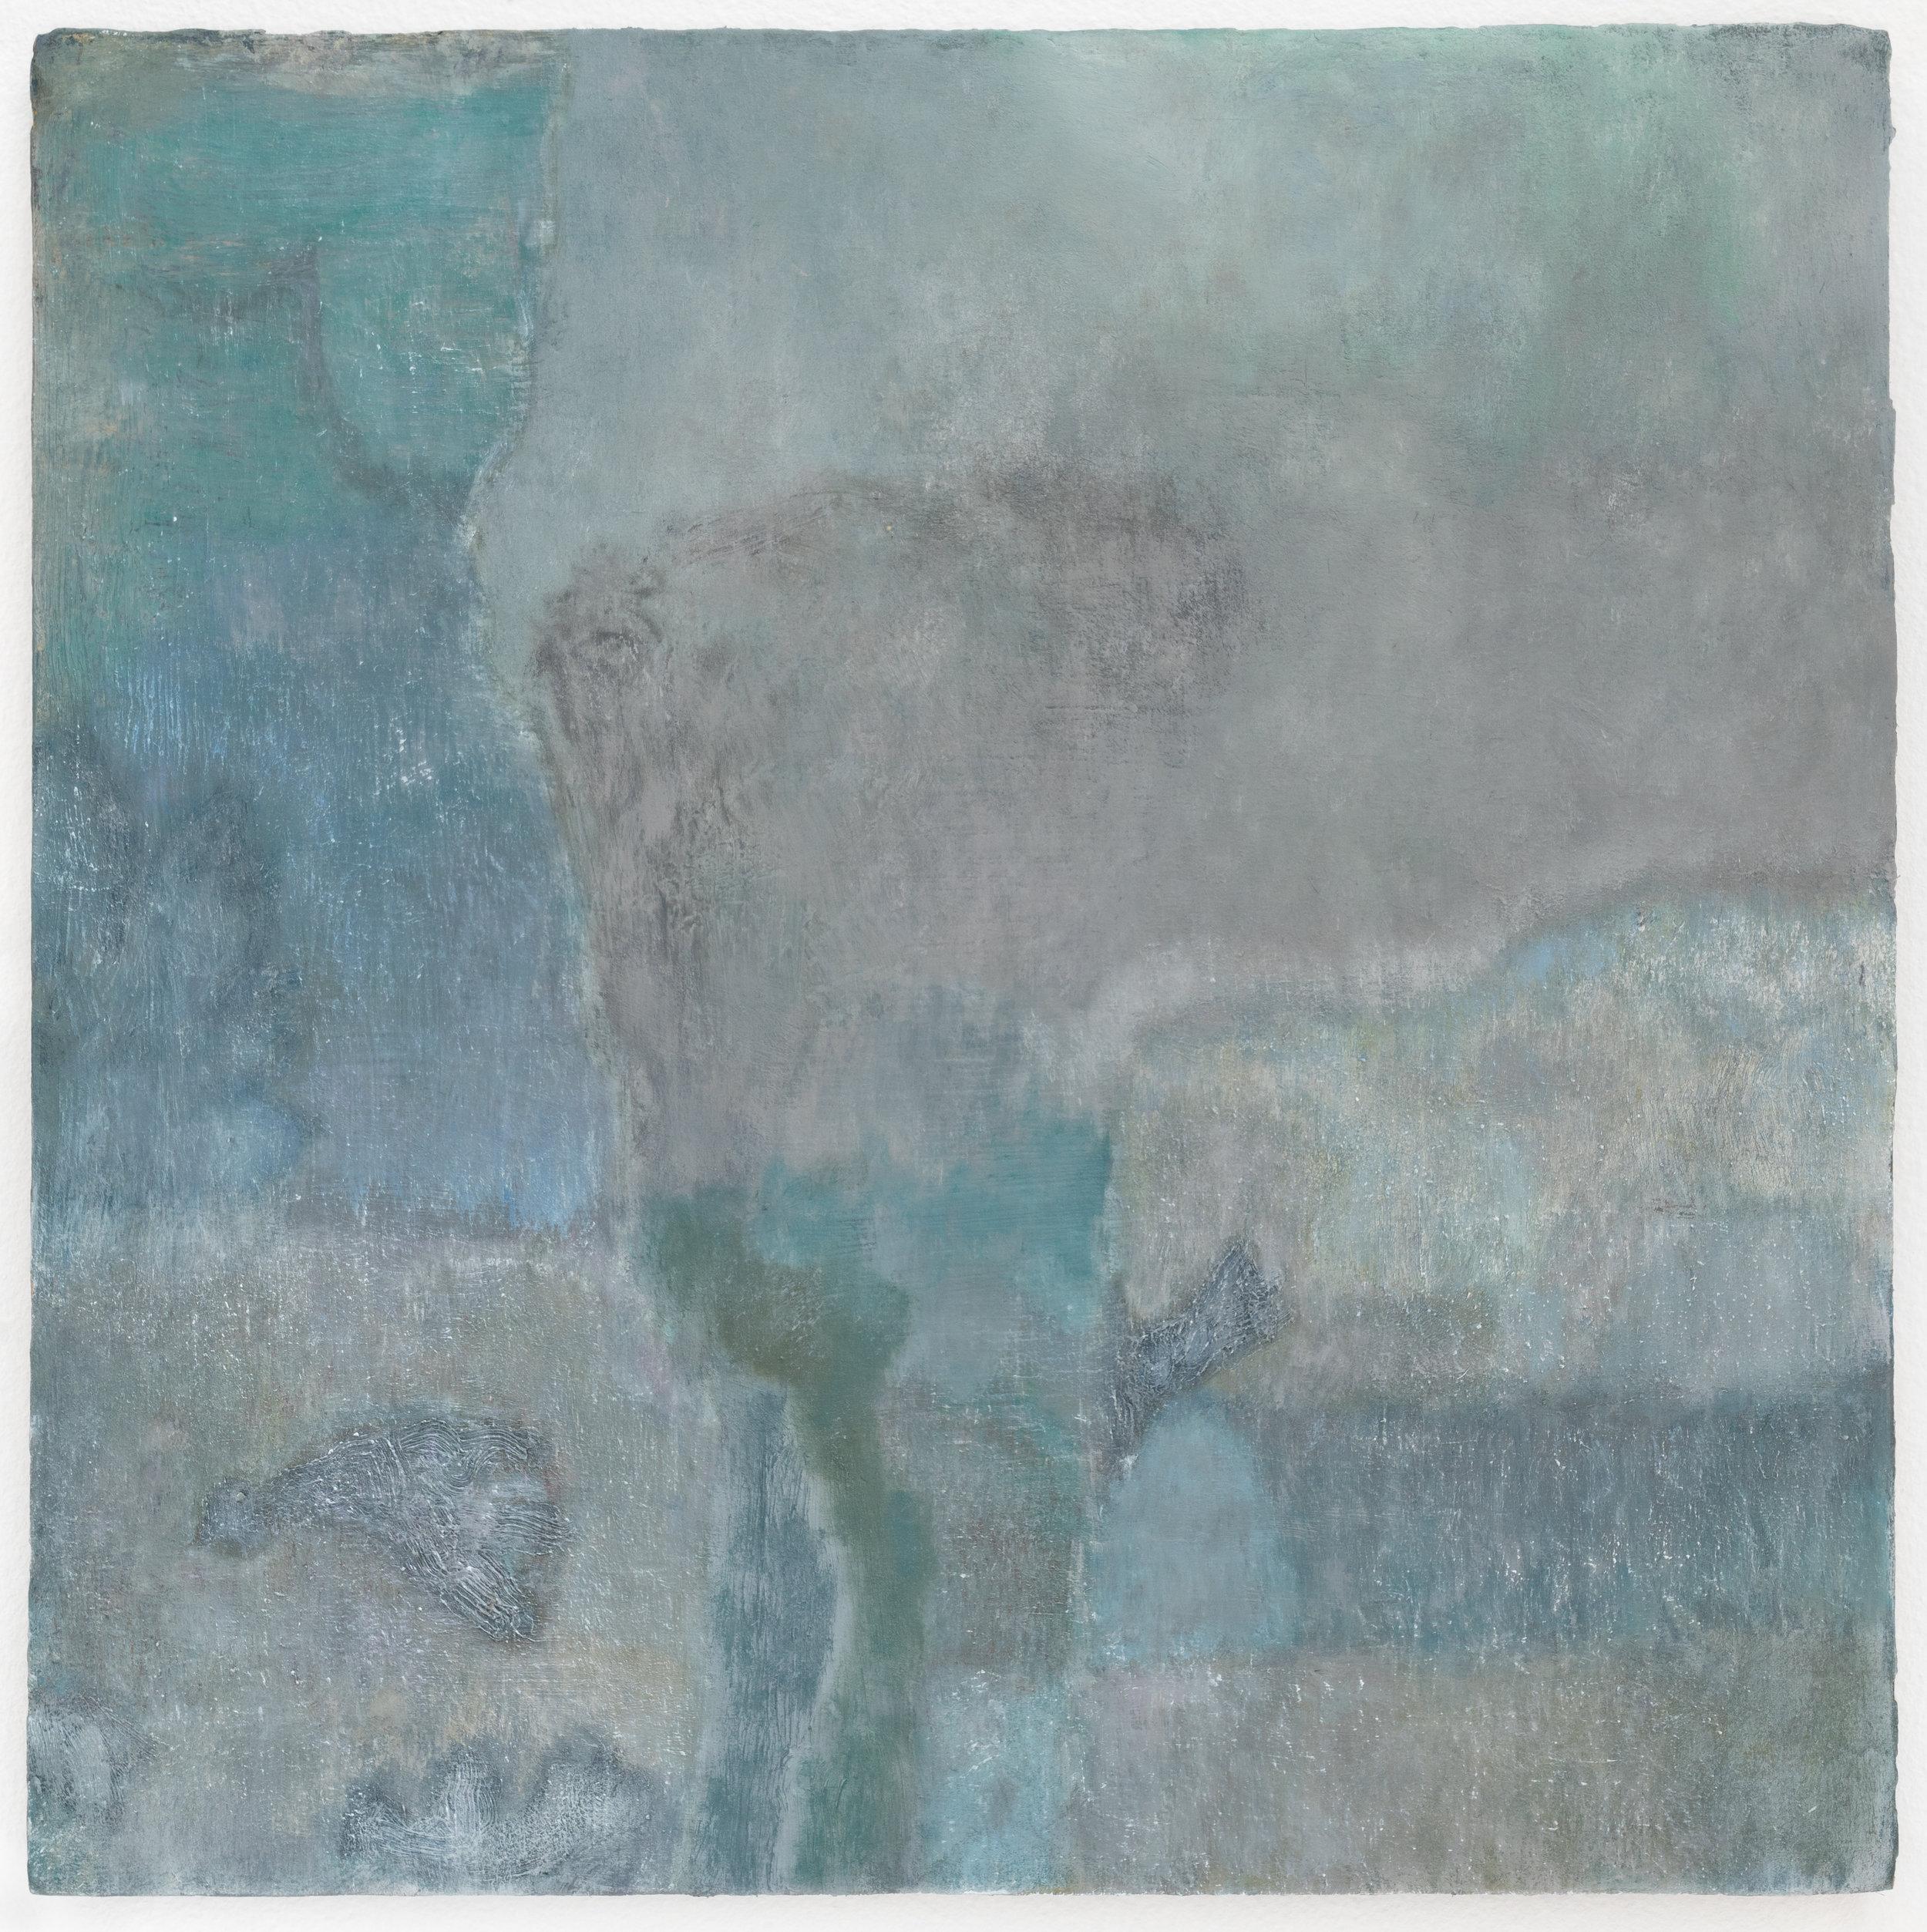 "Laurence Pilon, At rest, 2018, oil on panel, 12"" x 12"" (30 x 30 cm)"